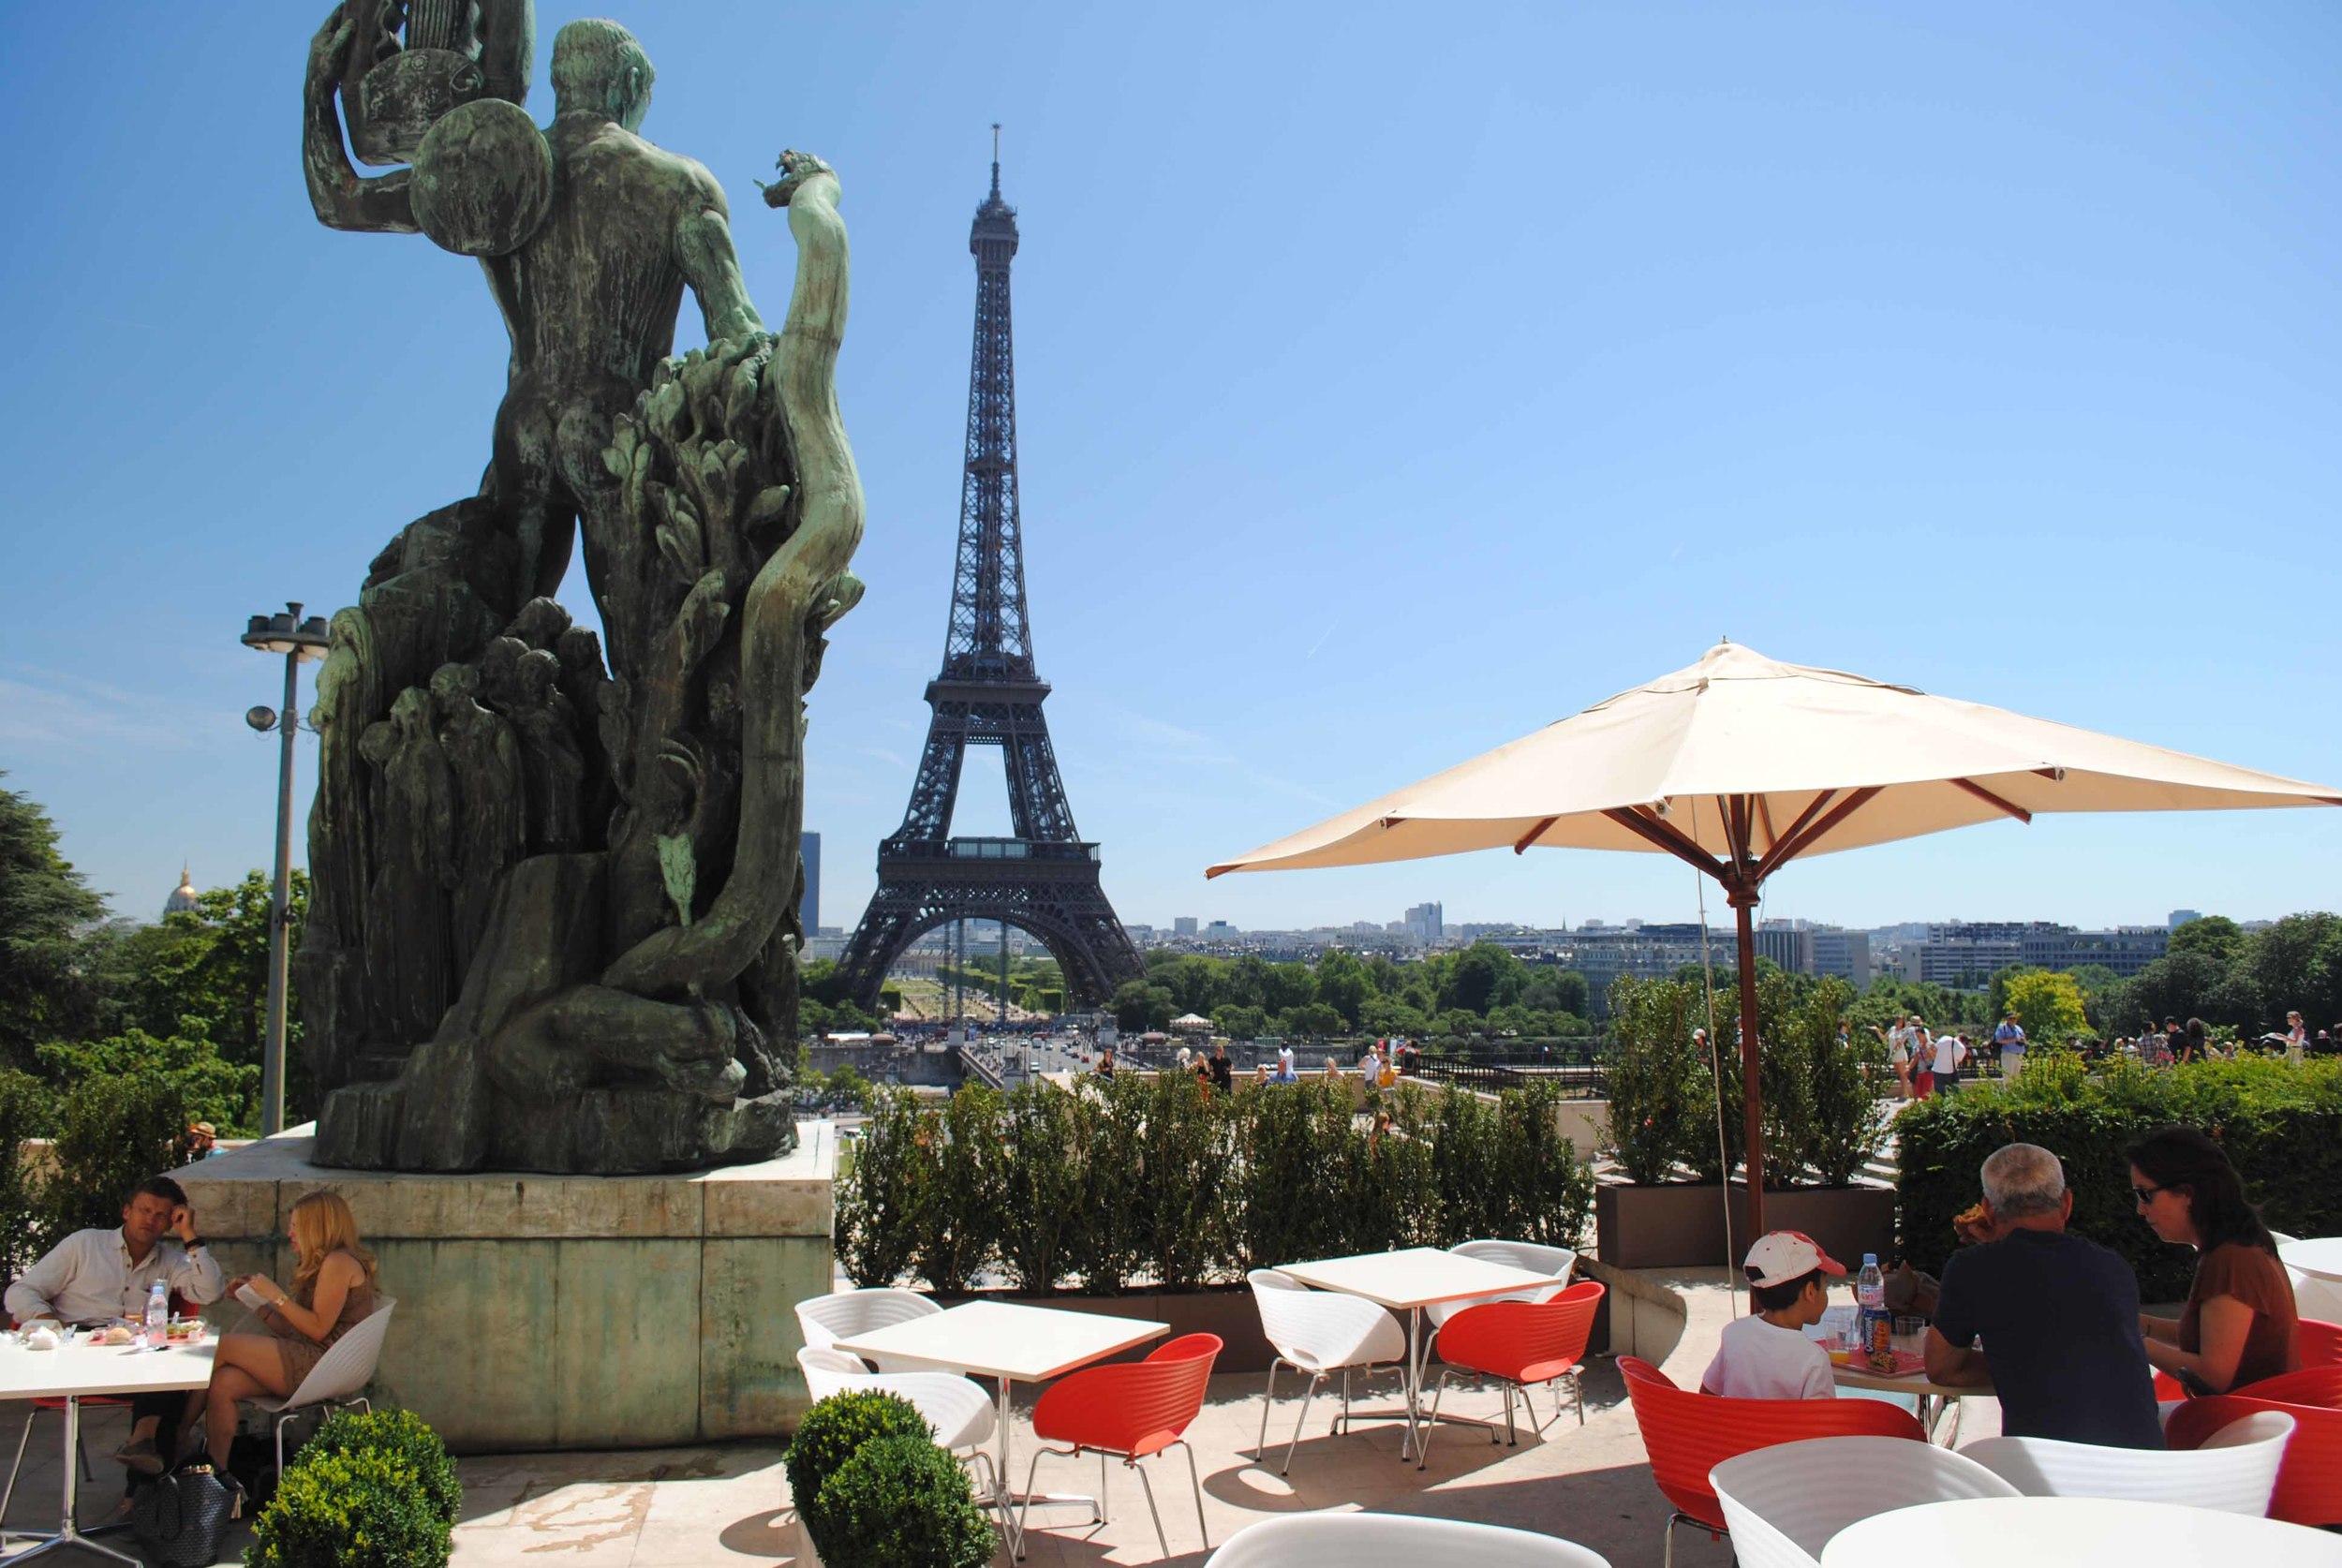 Eiffel Tower: Paris, France (Sojourner Tours)